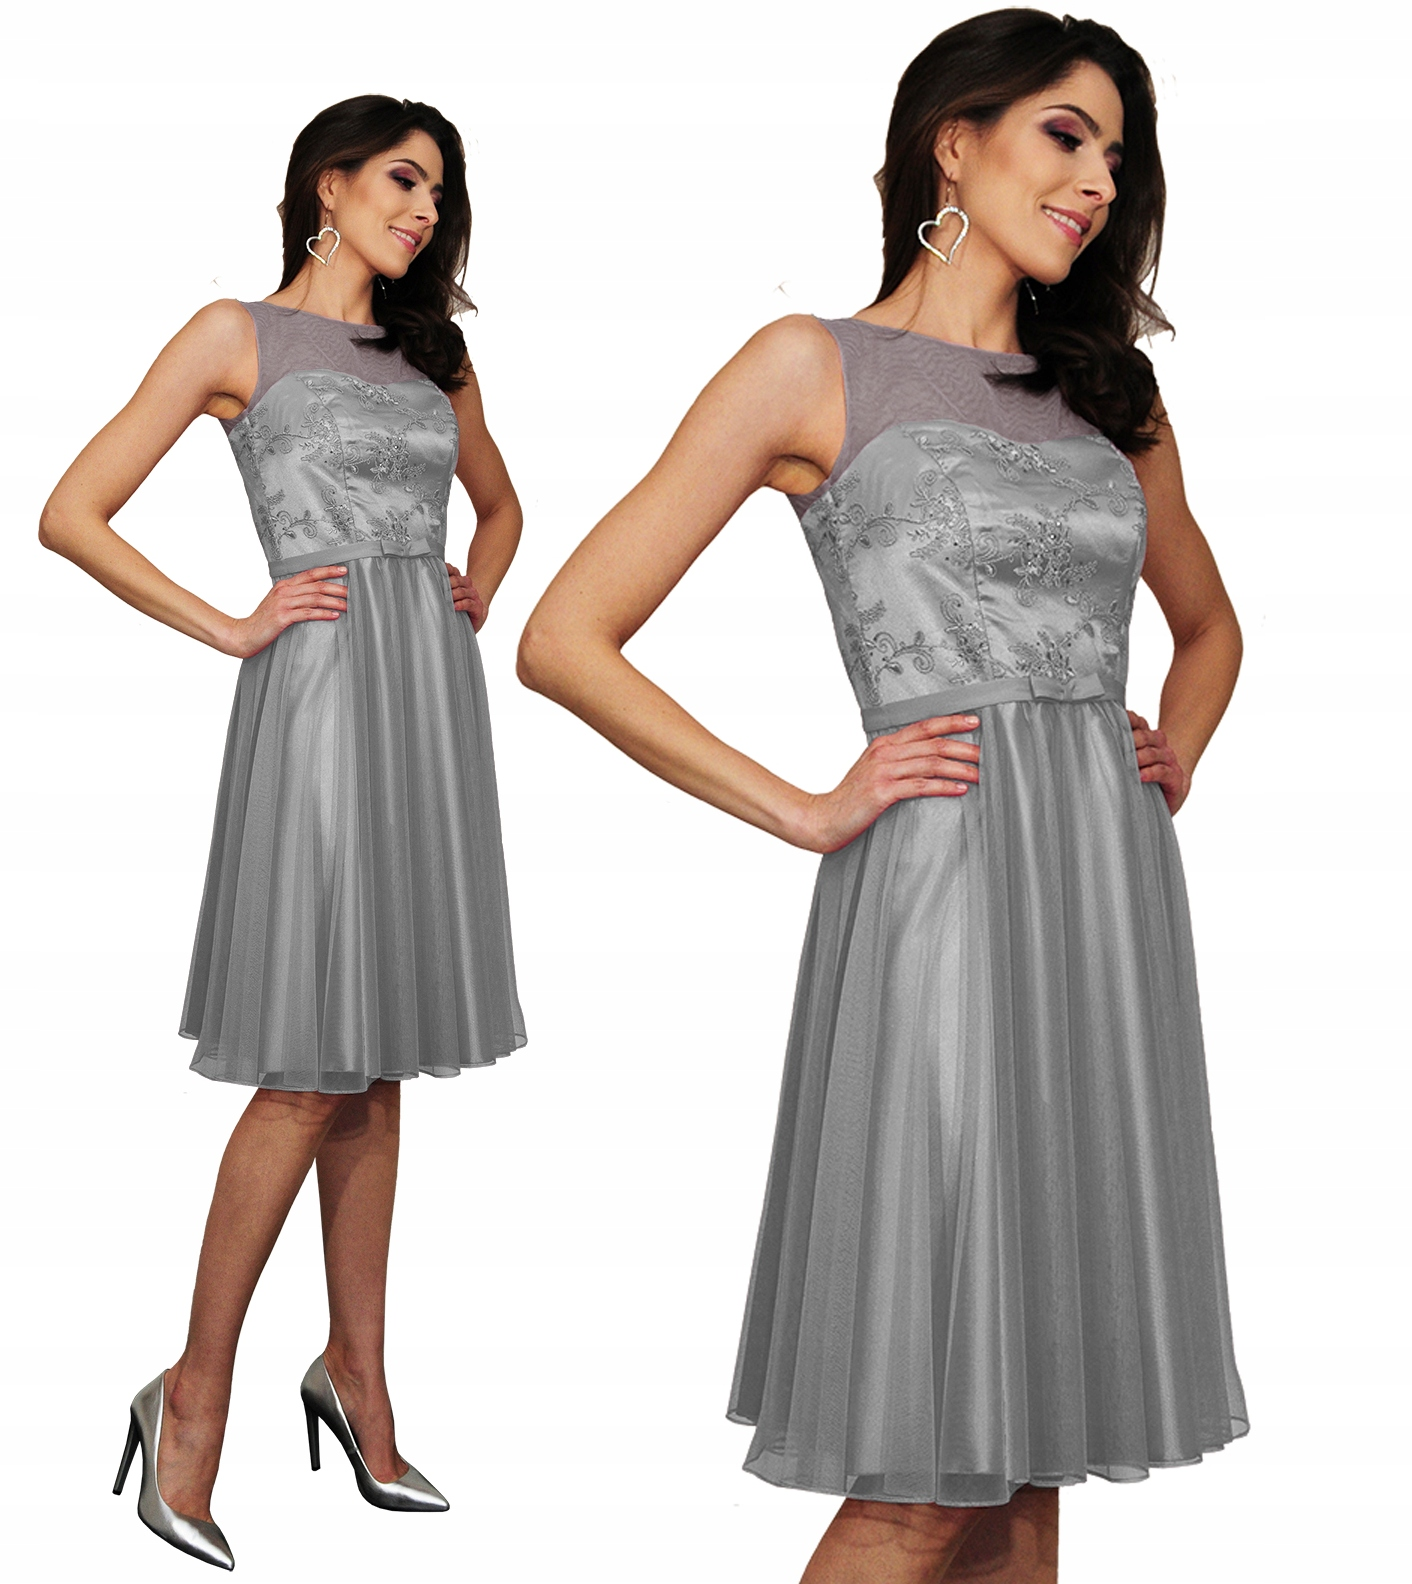 Camill 360 koronkowa sukienka wesele kolory 44